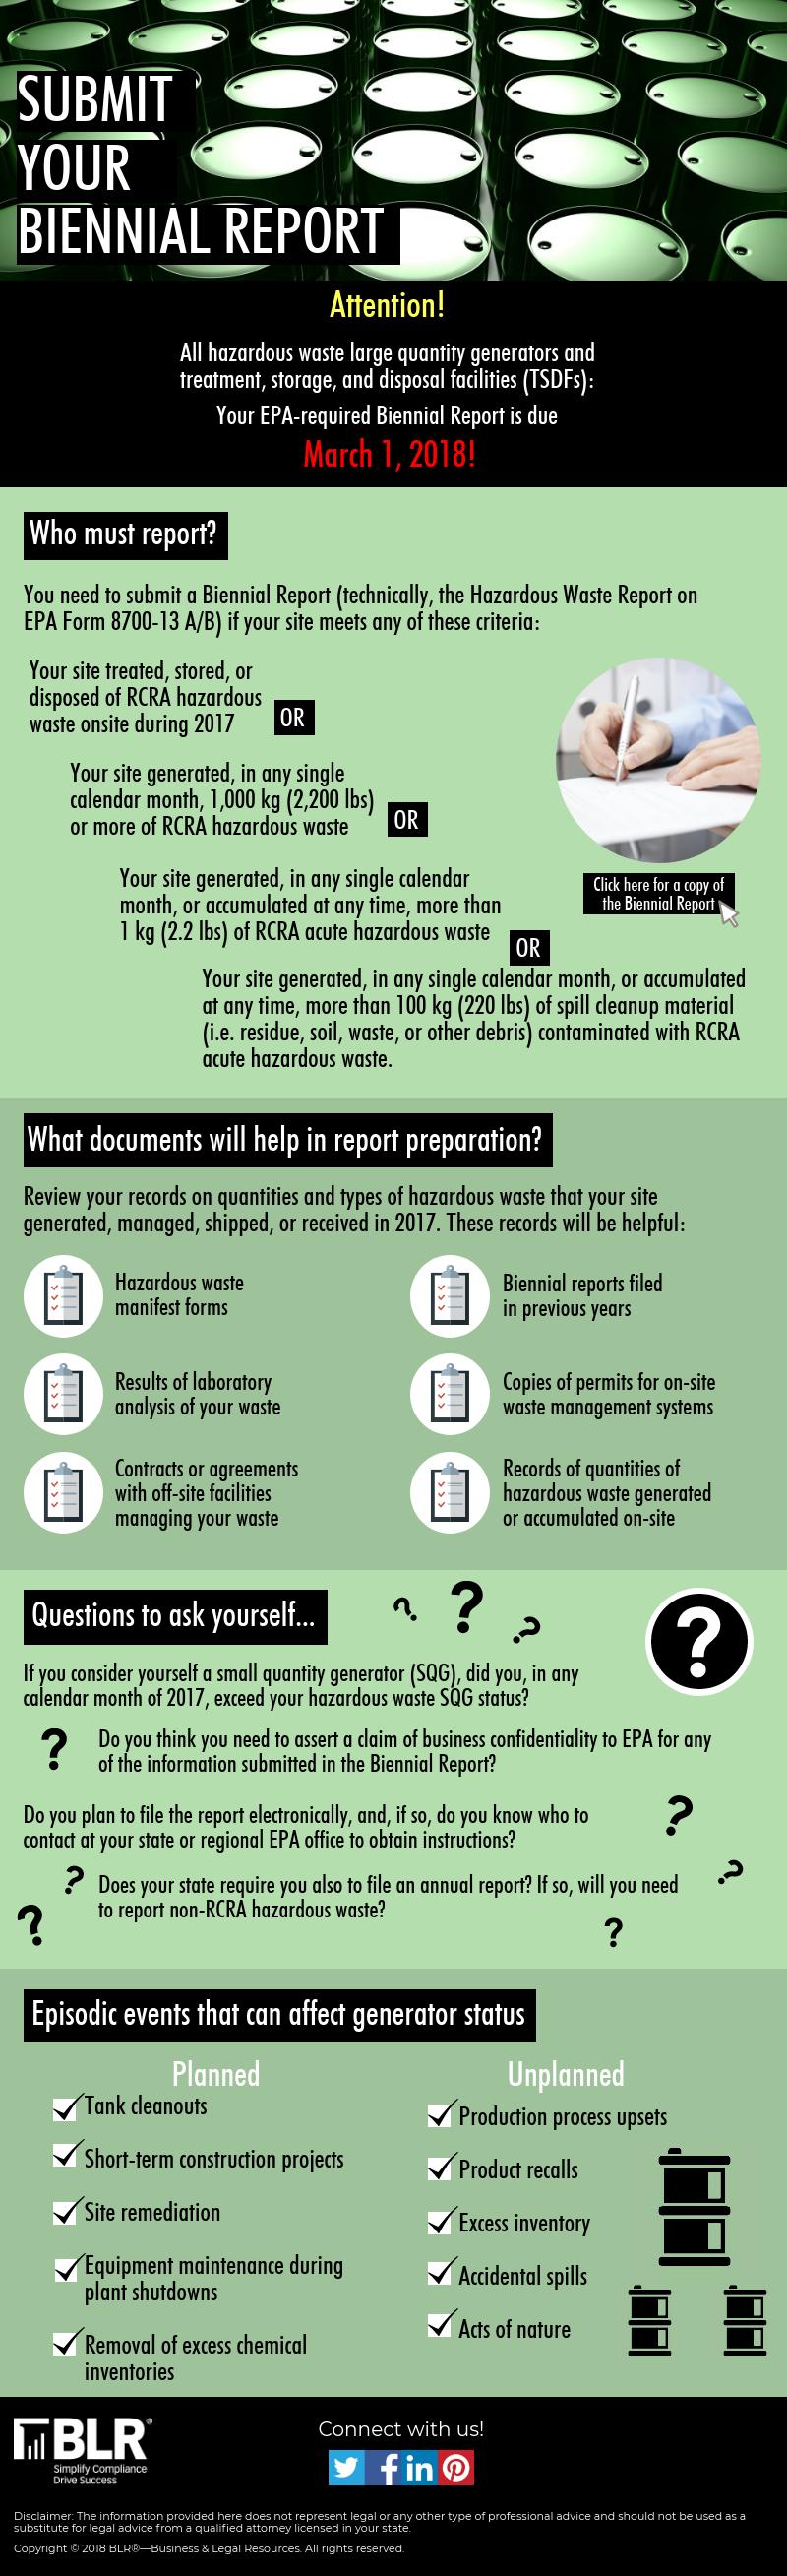 Biennial Report infographic